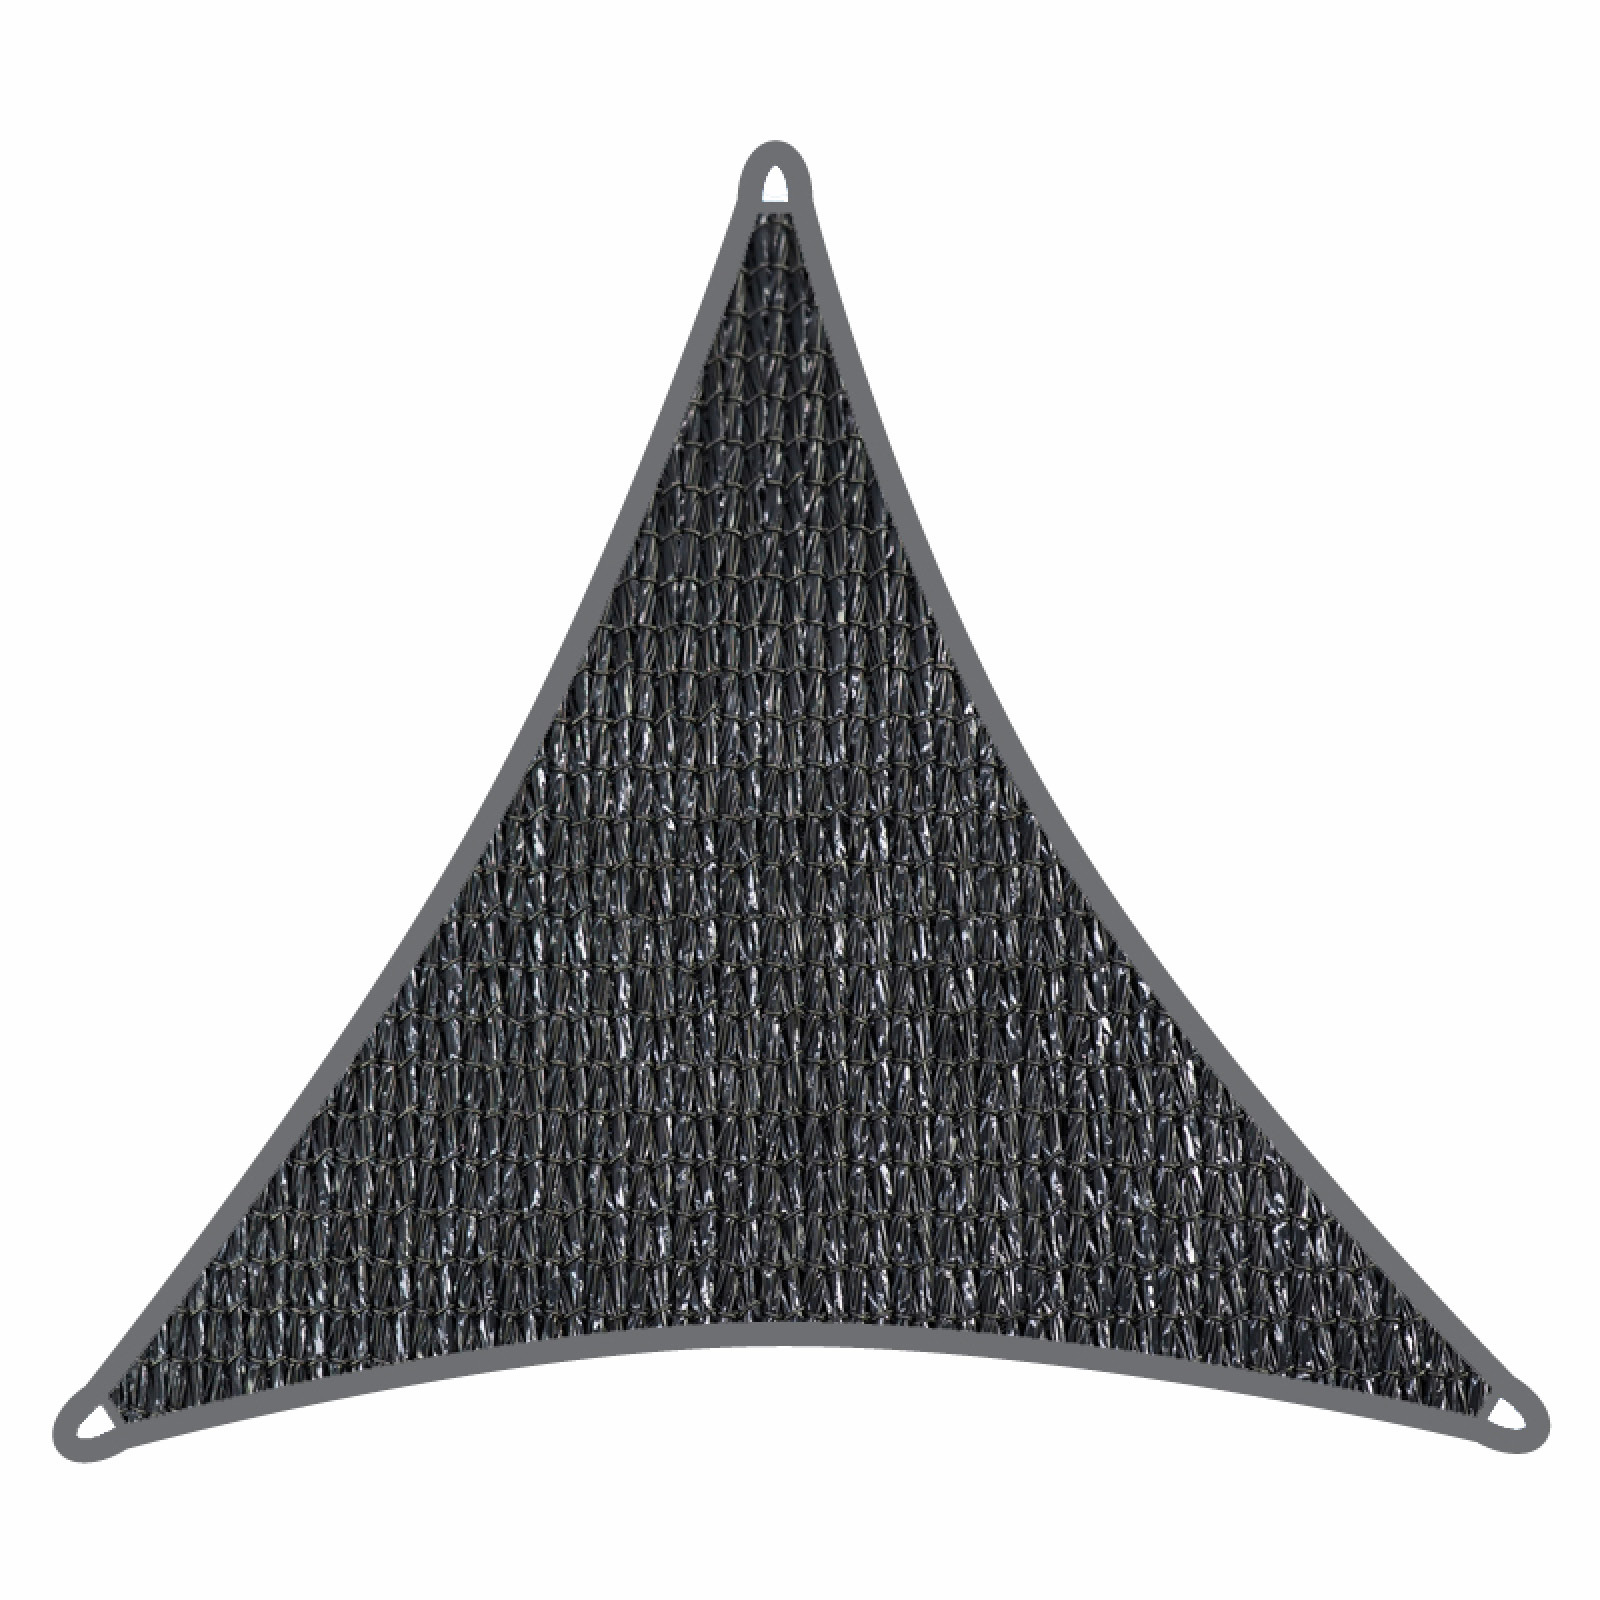 Coolaroo 3m Graphite Triangle Commercial Grade Shade Sail